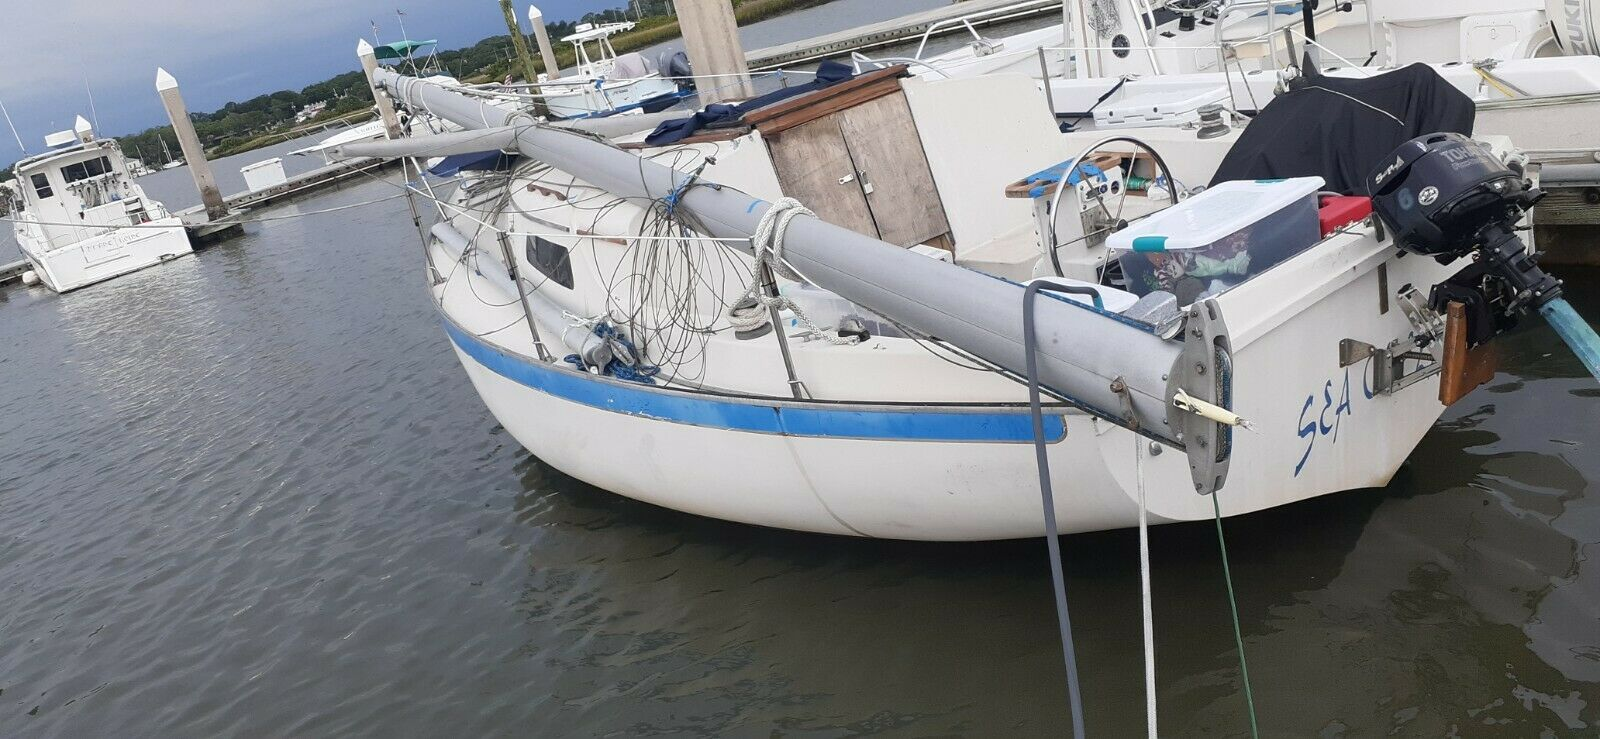 1976 Irwin 25' Sailboat - Florida